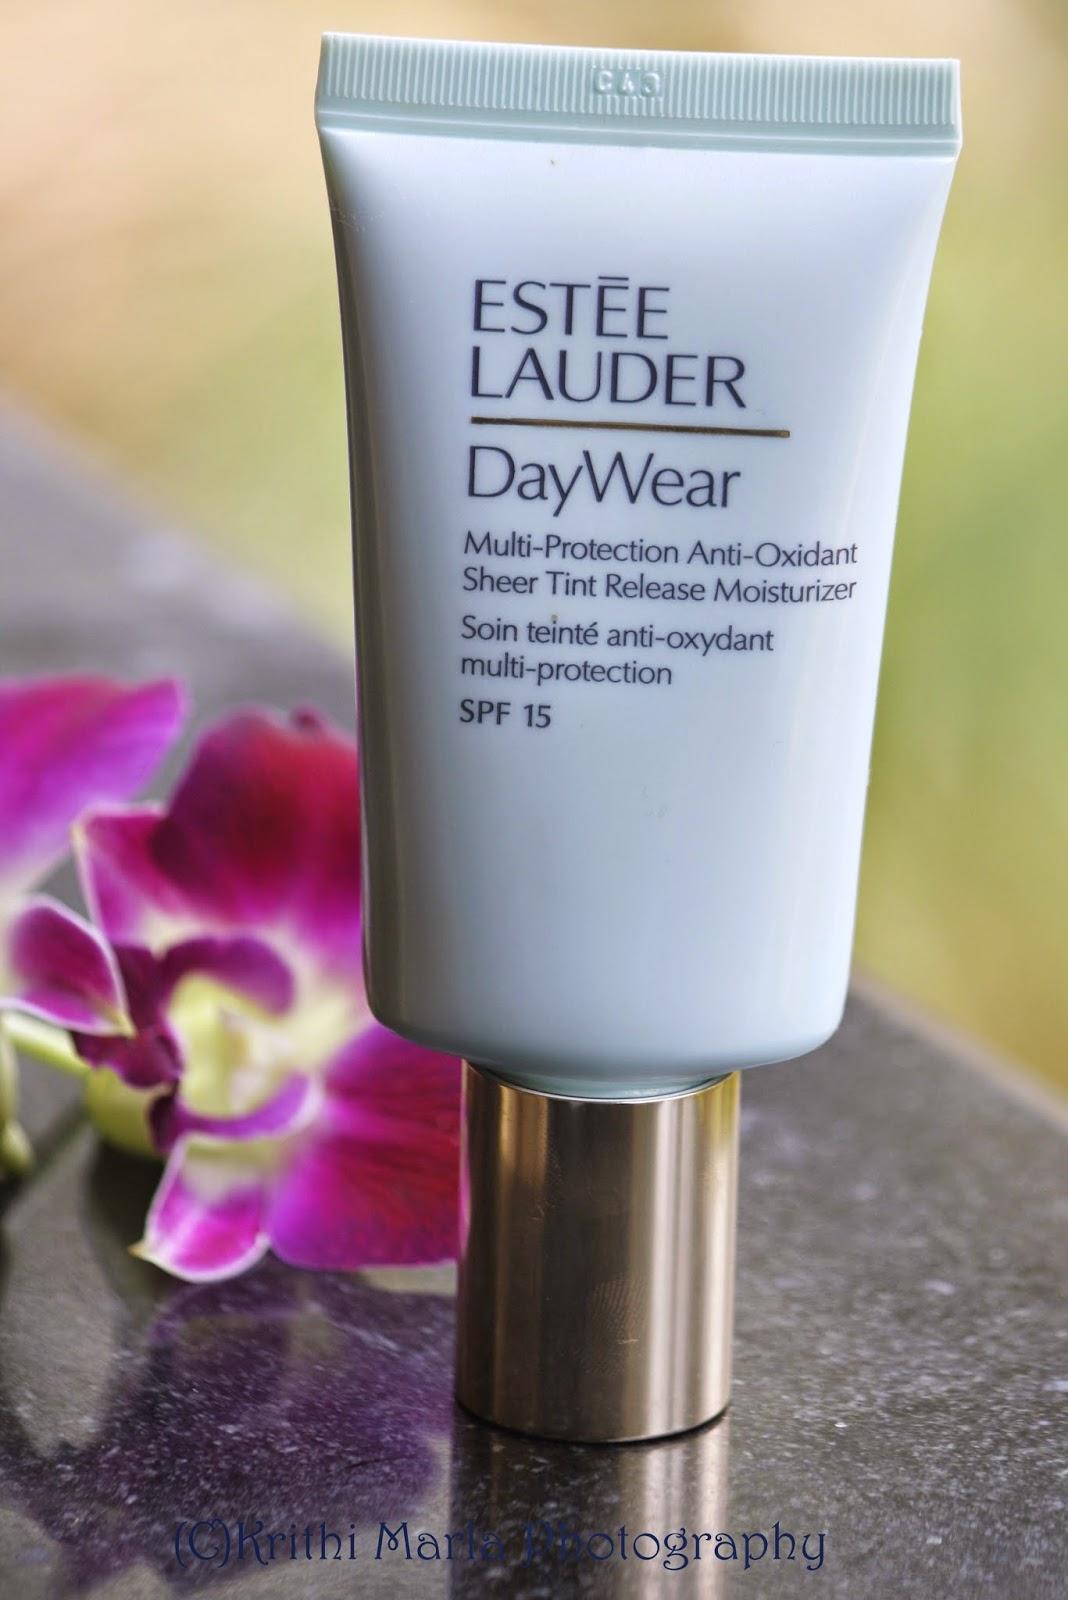 DayWear Multi-Protection Anti-Oxidant Sheer Tint Release Moisturizer SPF 15 by Estée Lauder #17